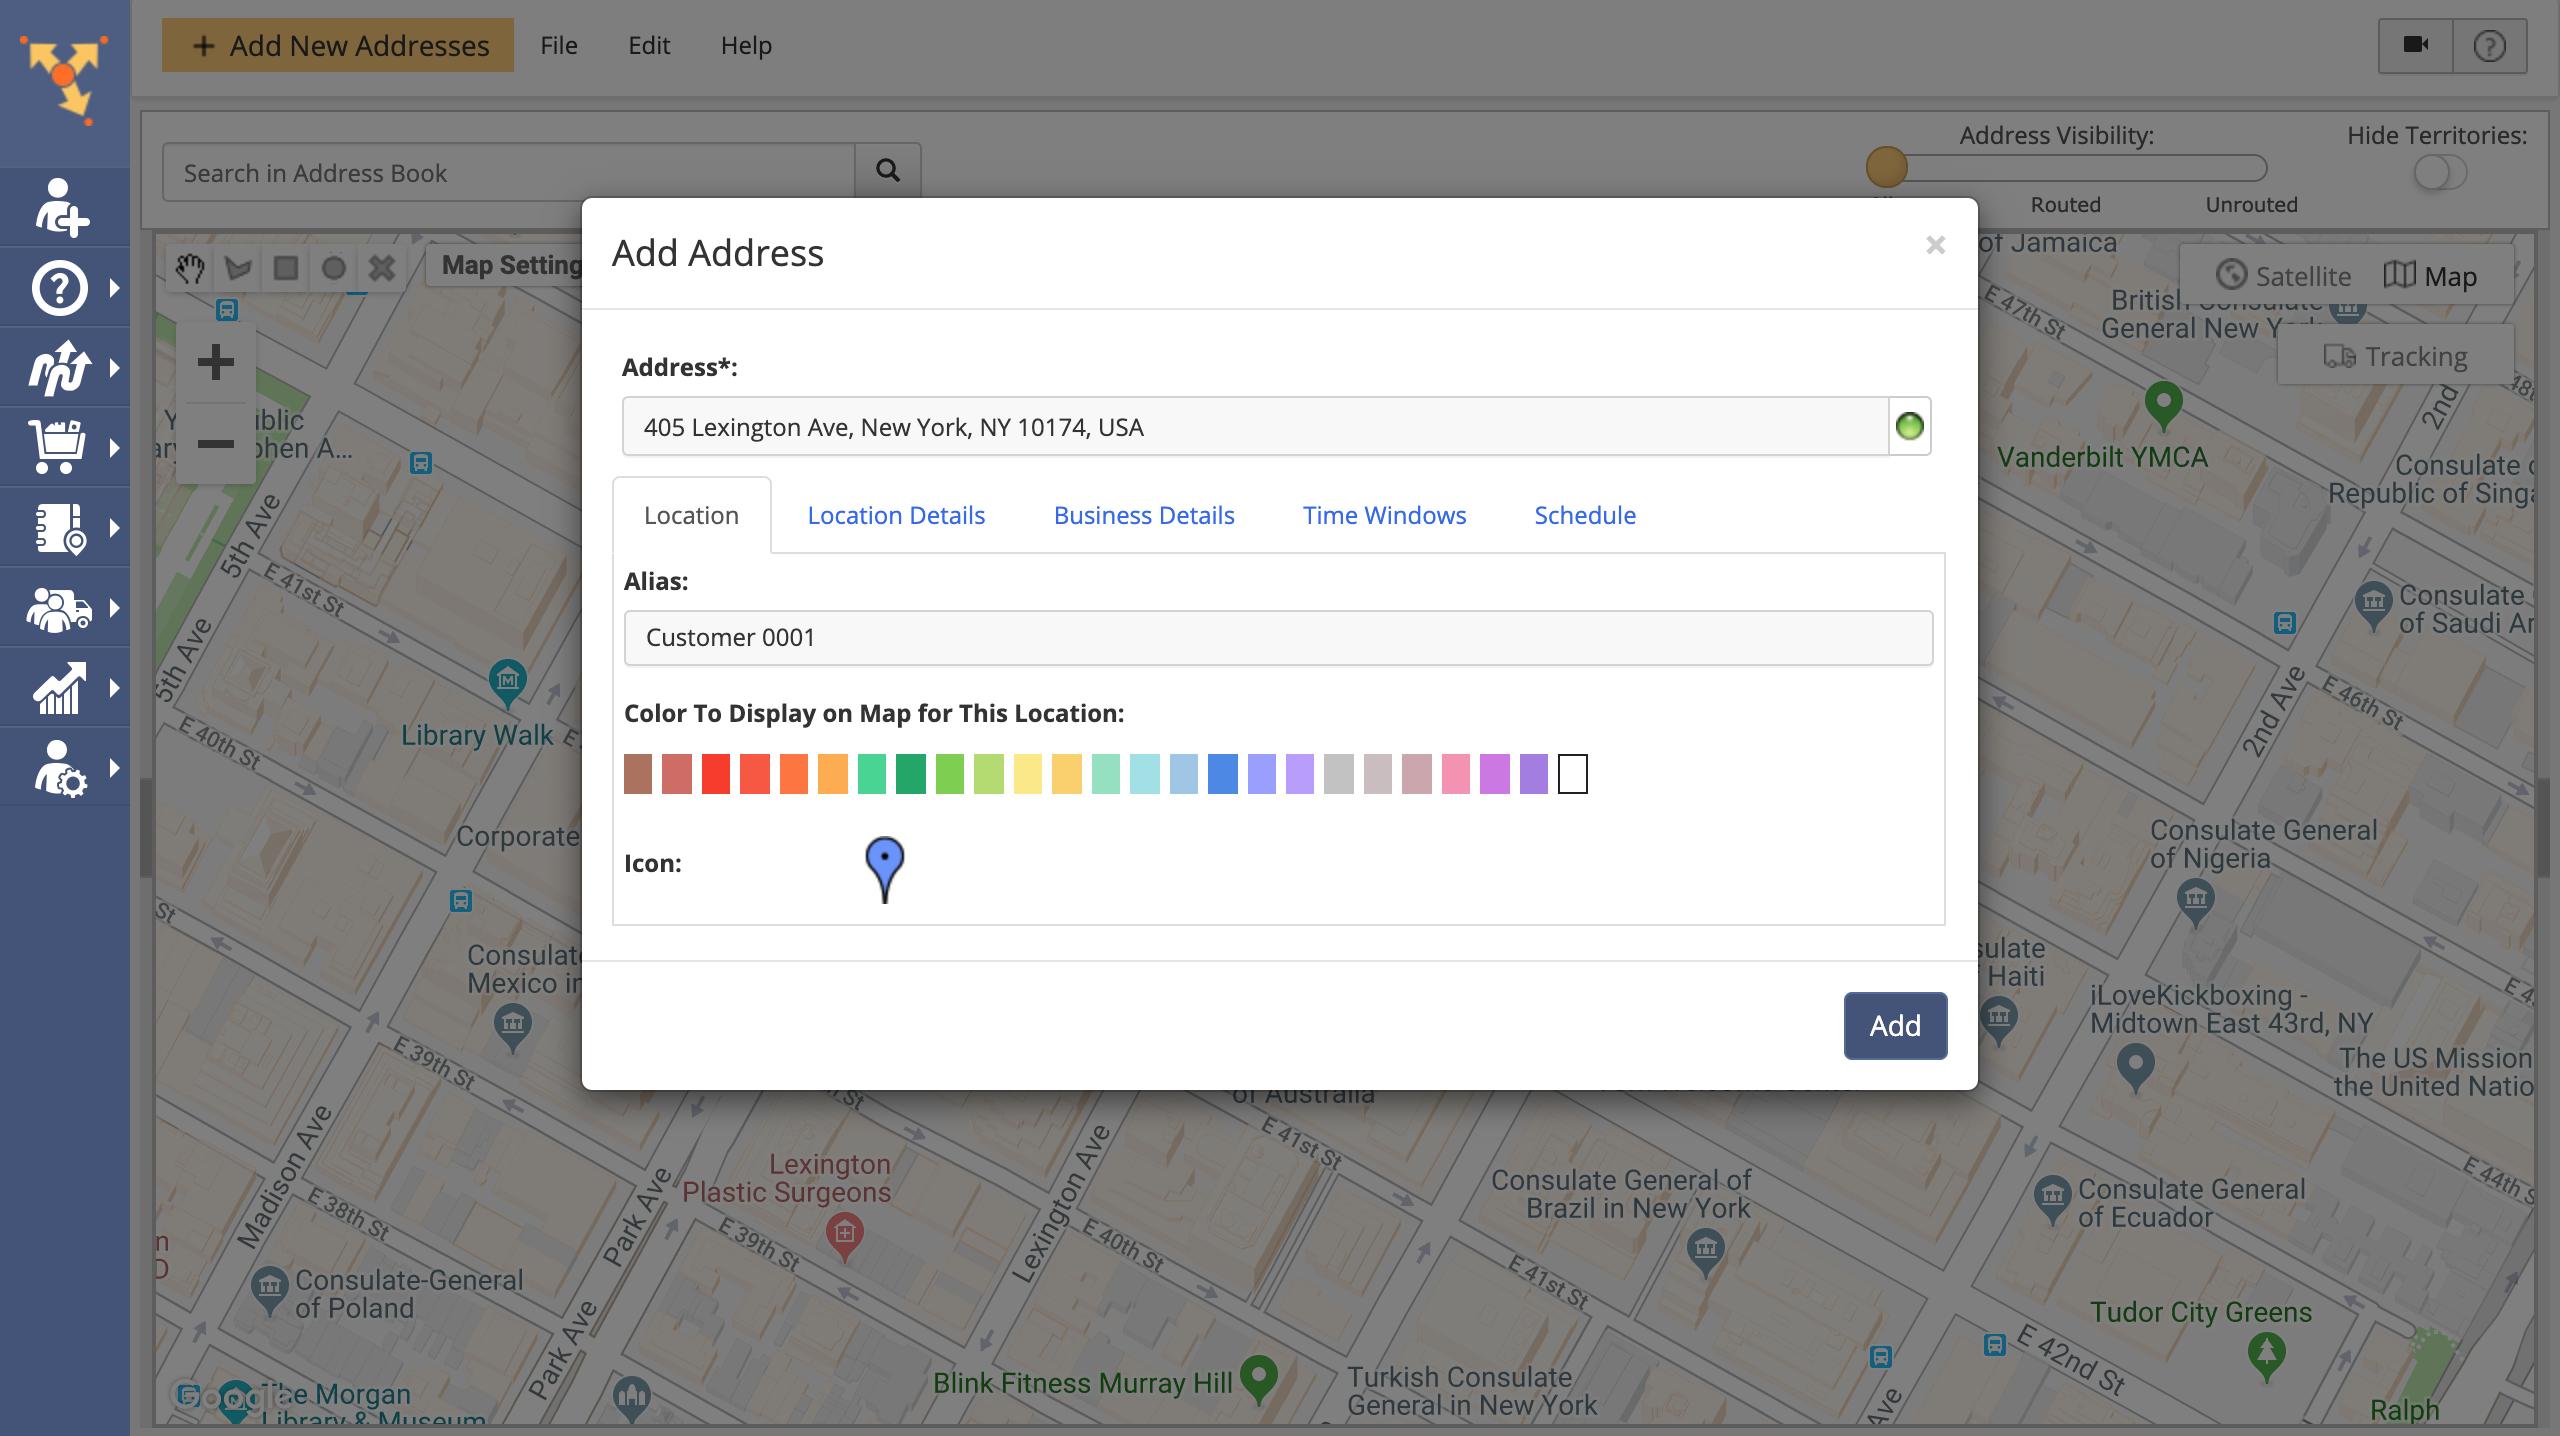 Saving Addresses and Creating Customer Profiles Using the